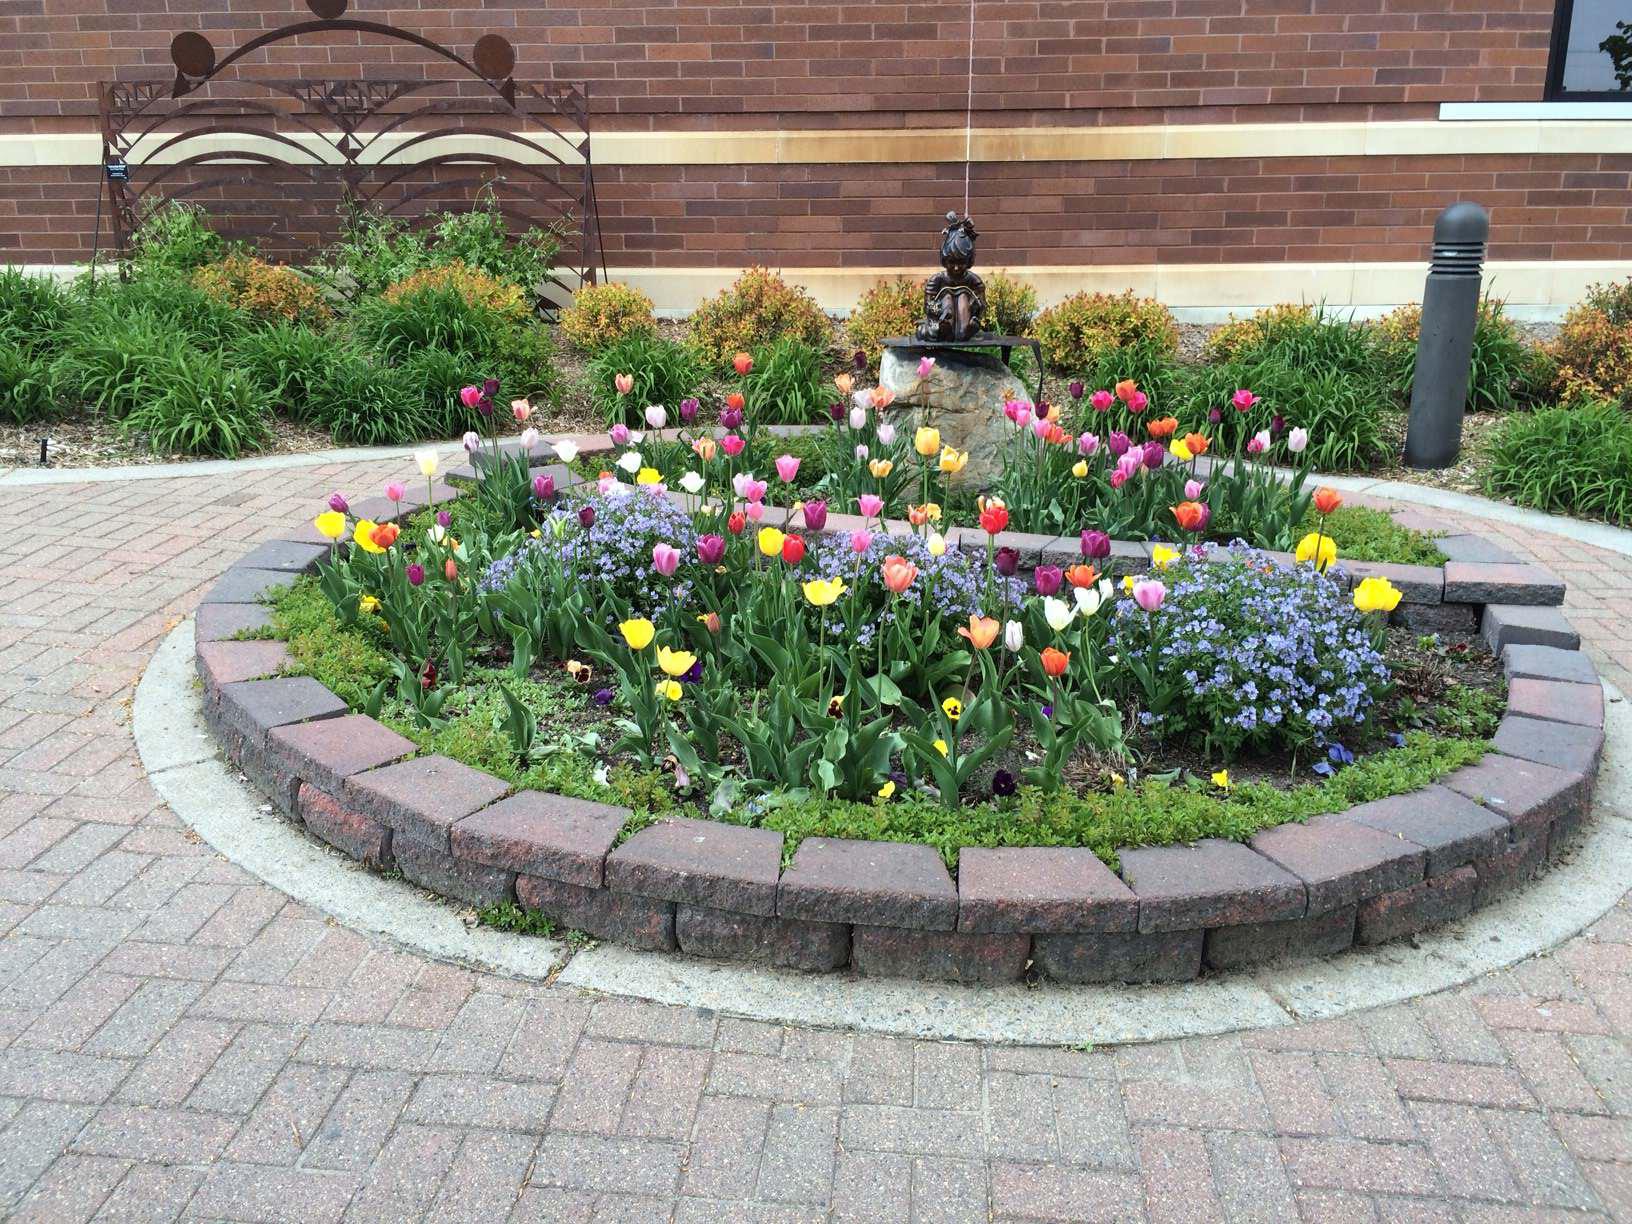 Bemidji Garden Club project garden